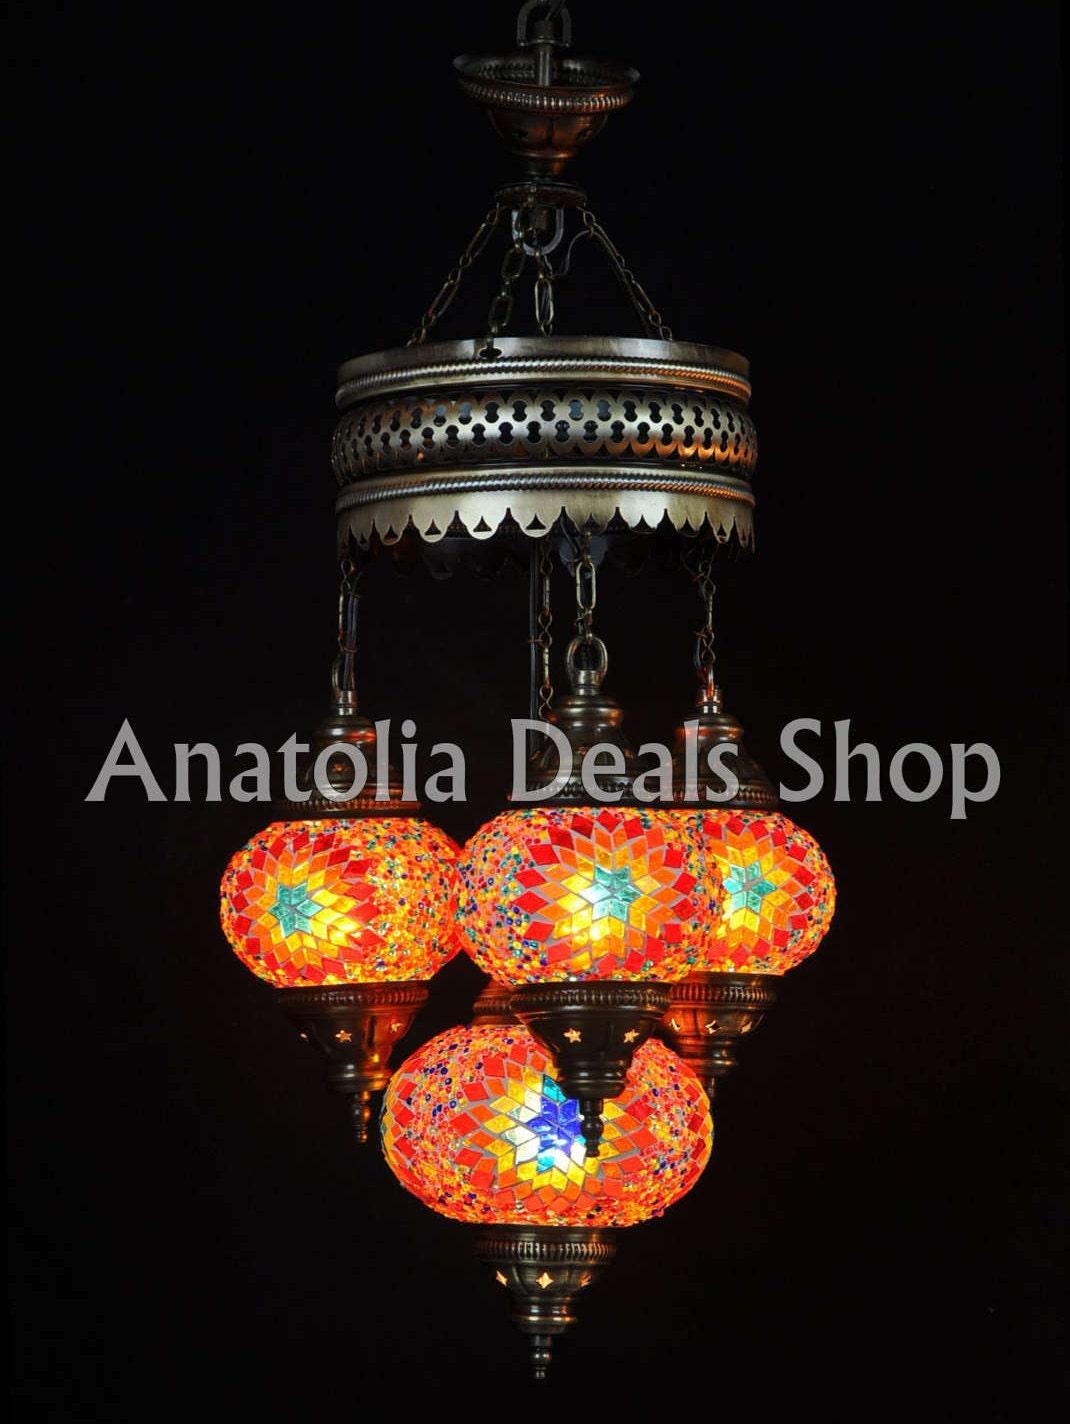 4 Mosaic Chandelier, Turkish Chandelier, Turkish Lighting, Ottoman Lamps, Turkish Lamp, Turkish Hanging Lamp, Turkish Mosaic Lamp SULTAN 4